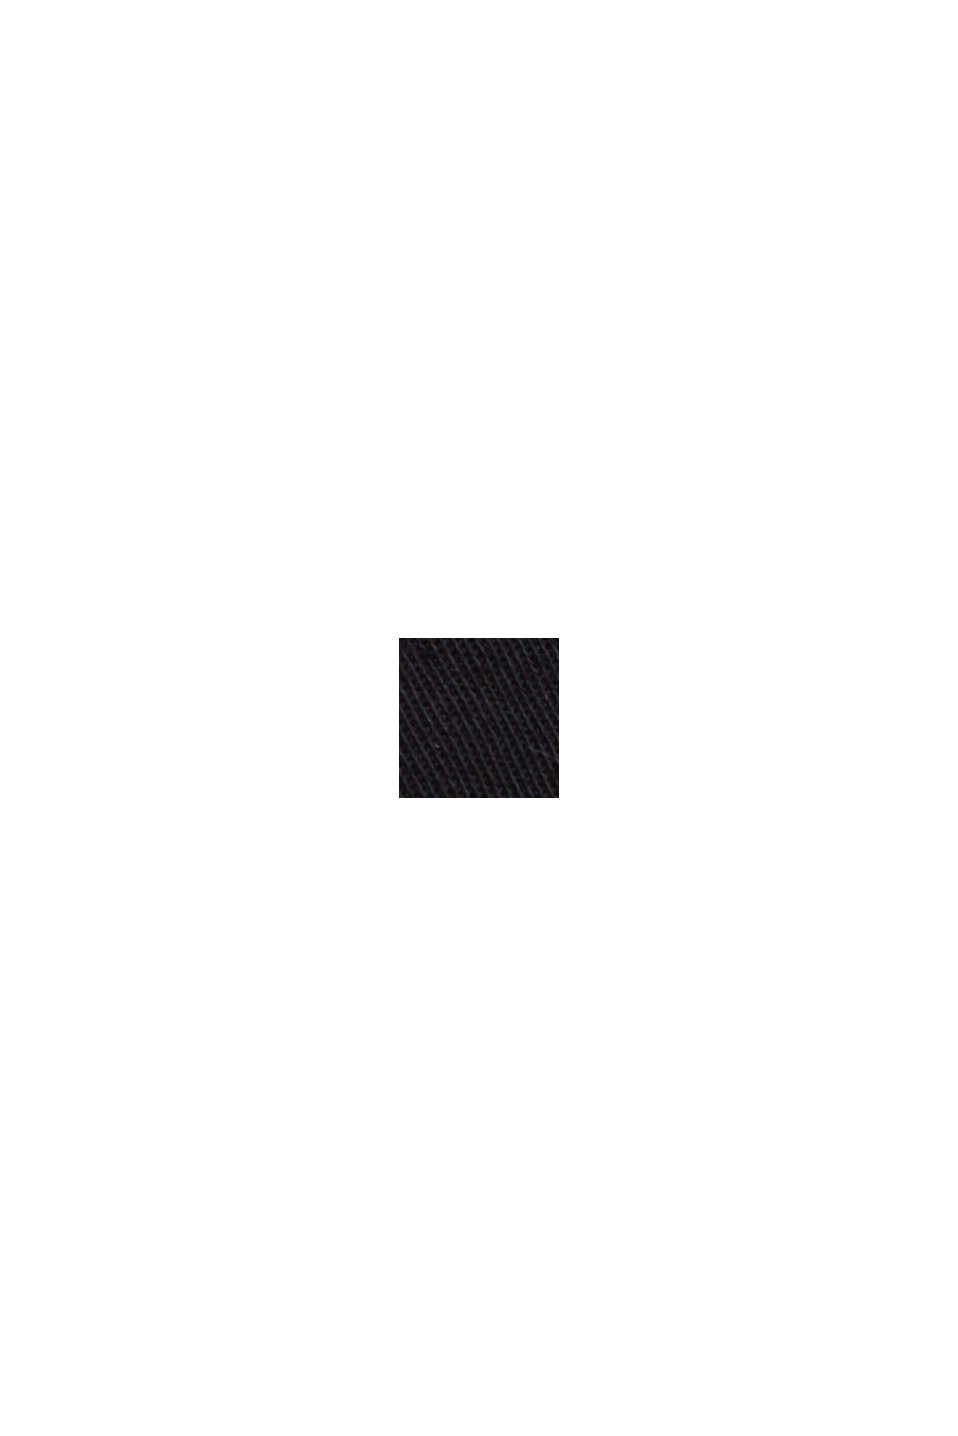 PLAY Shorts de algodón, BLACK, swatch